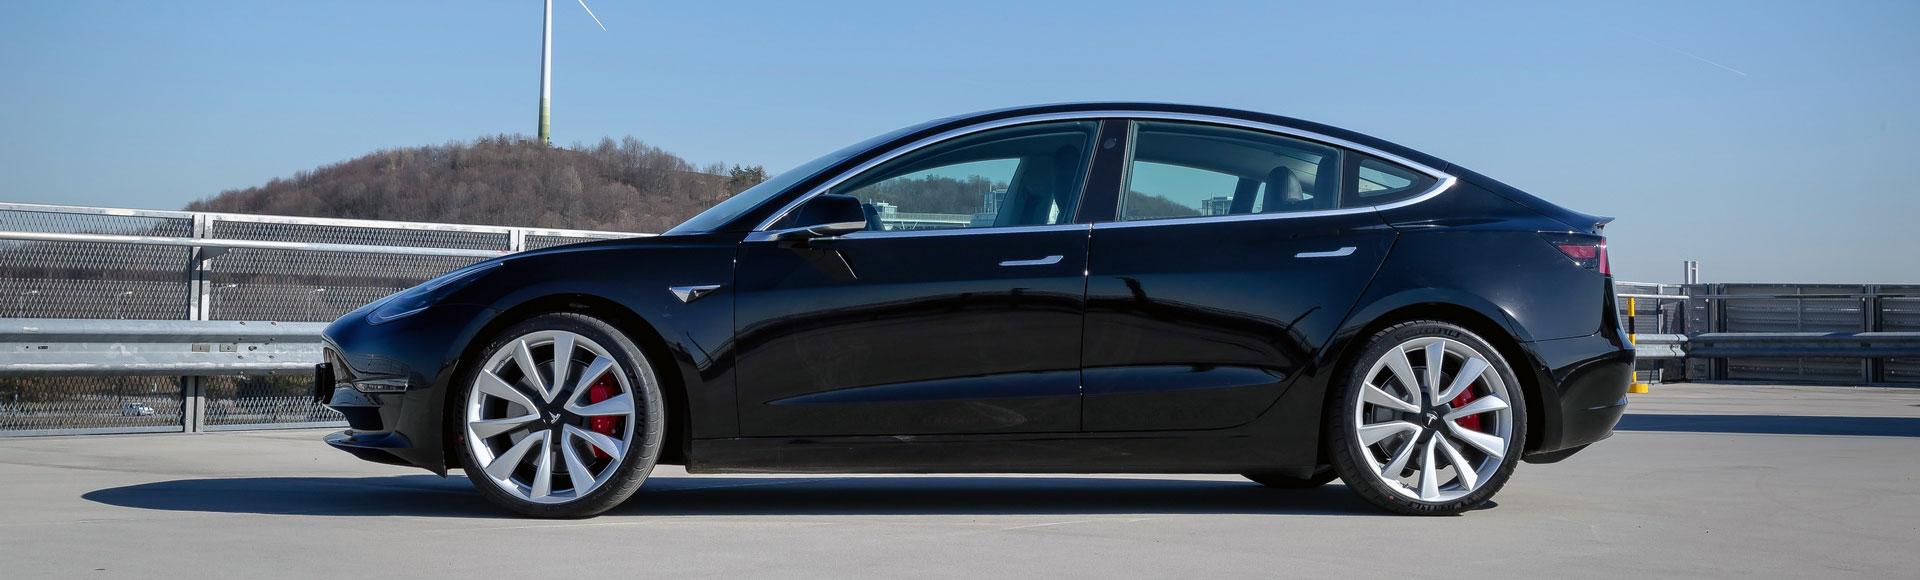 Tesla Model 3 2019 023